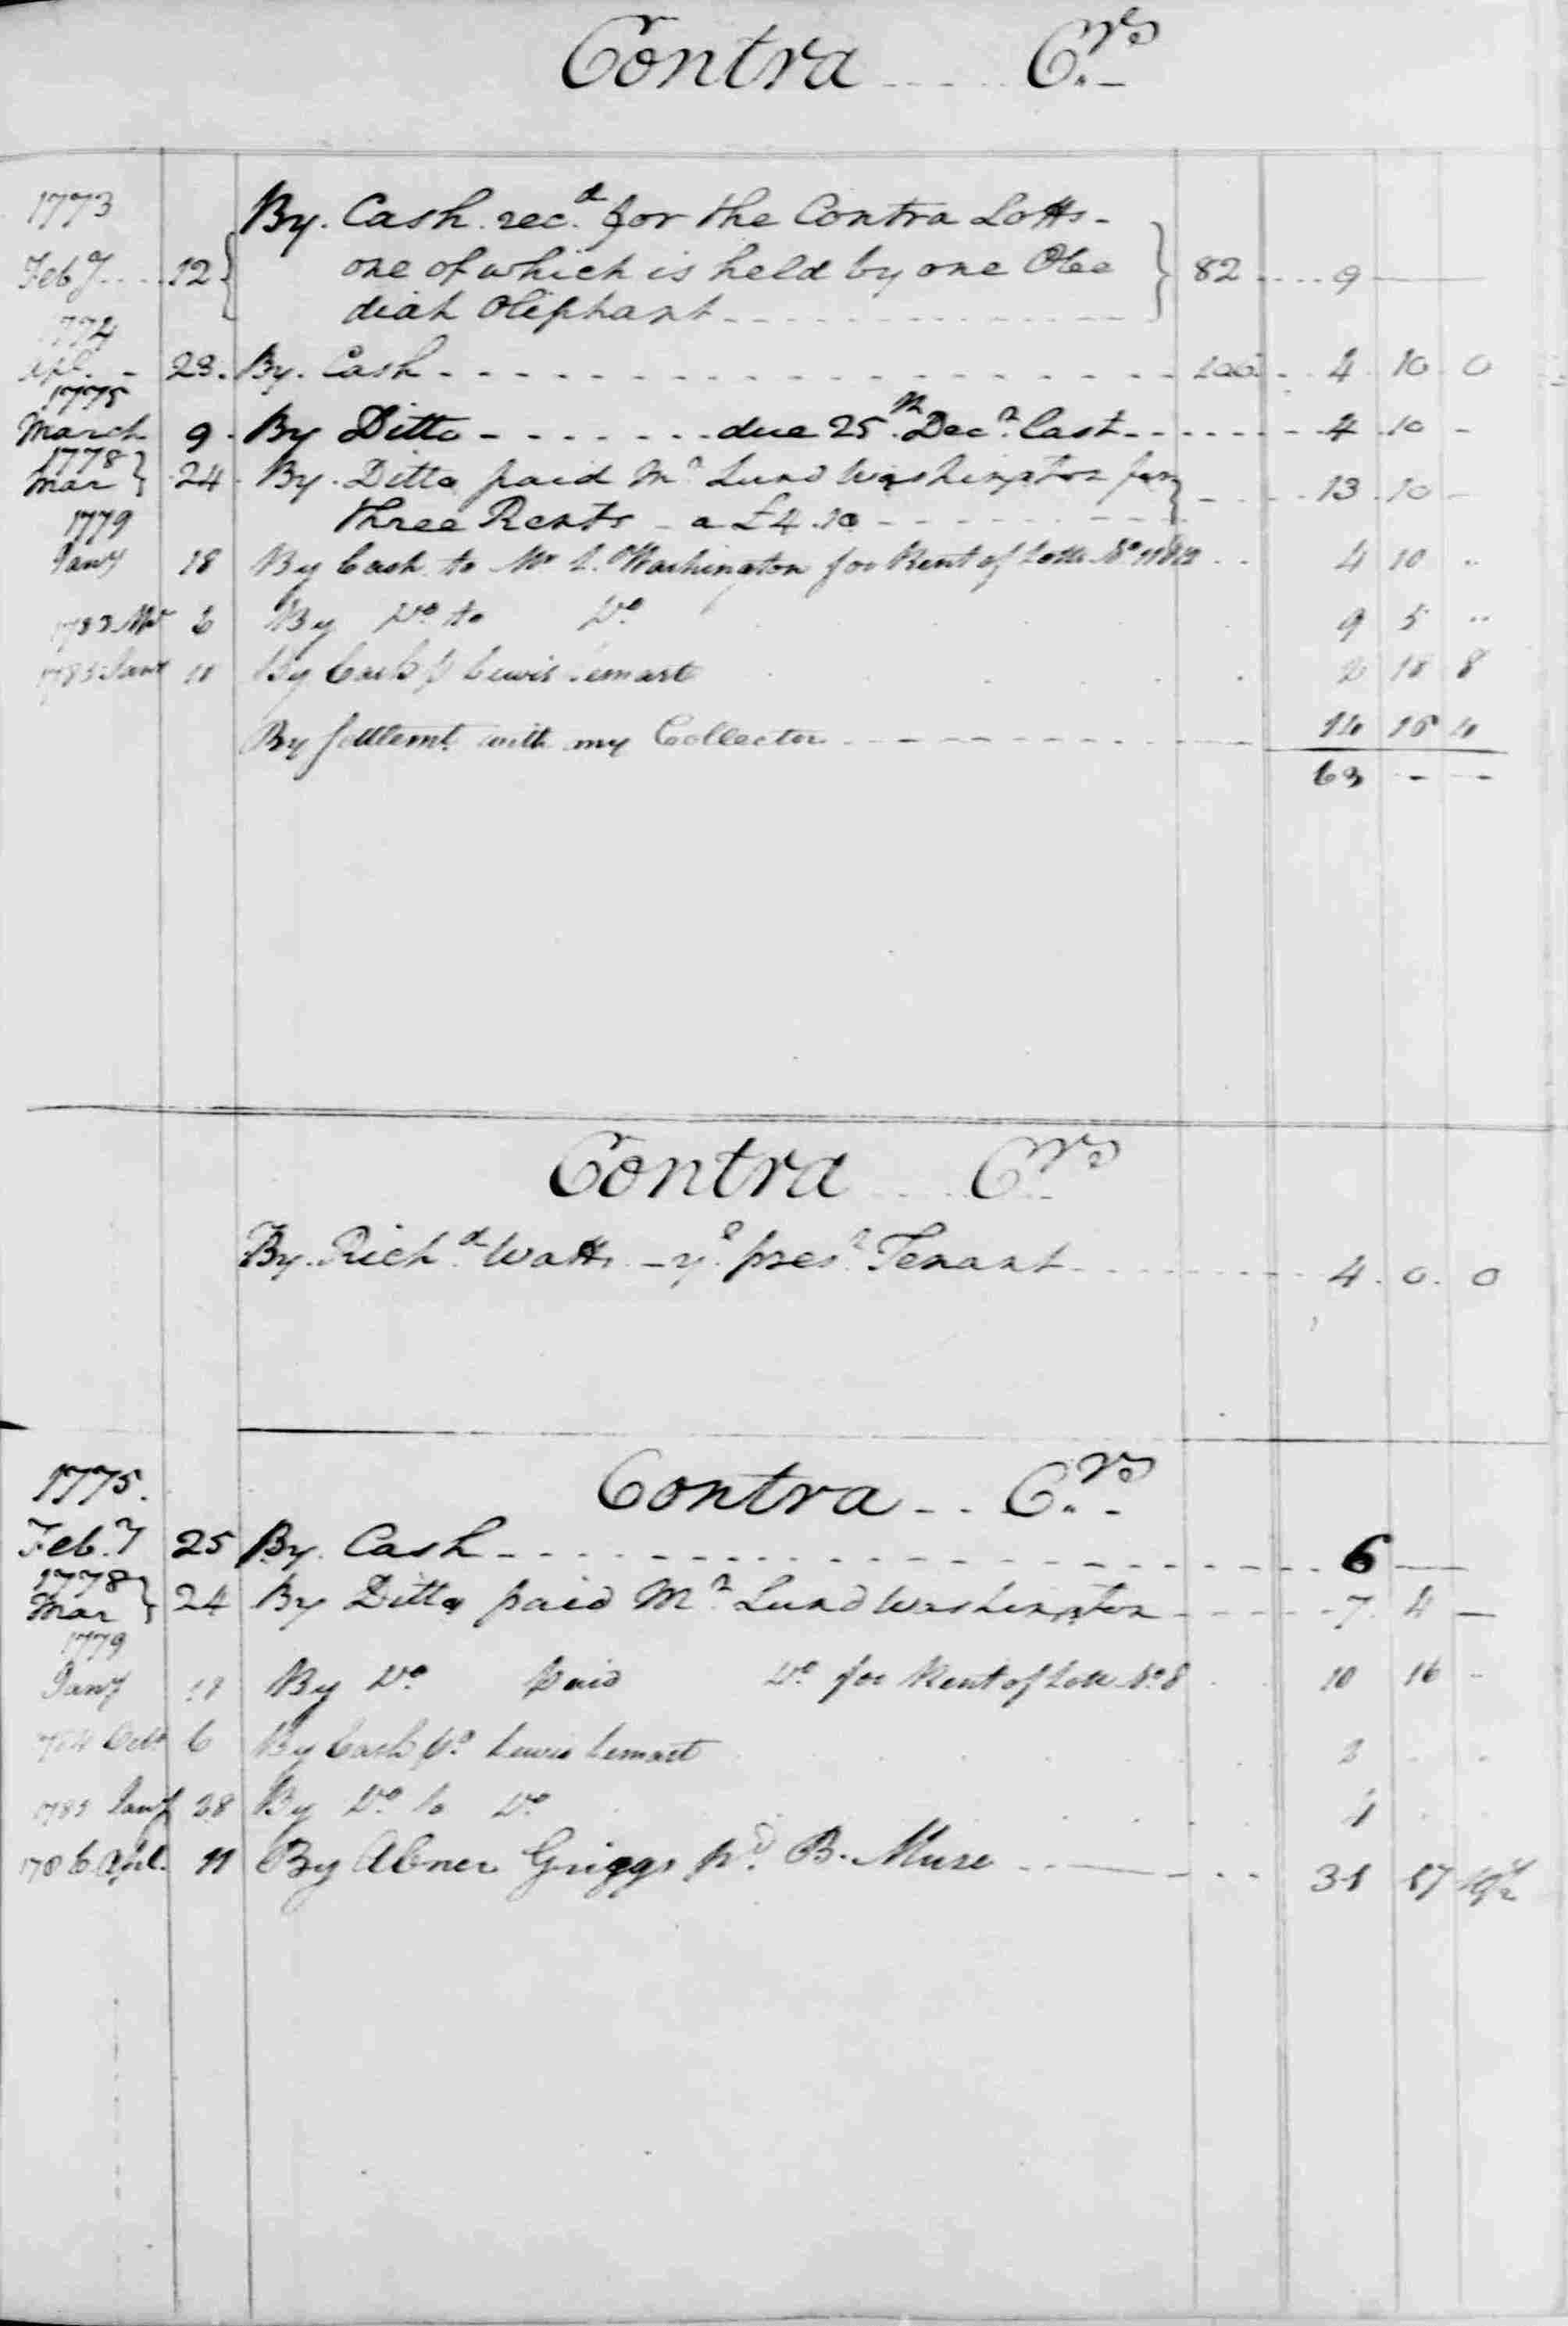 Ledger B, folio 67, right side